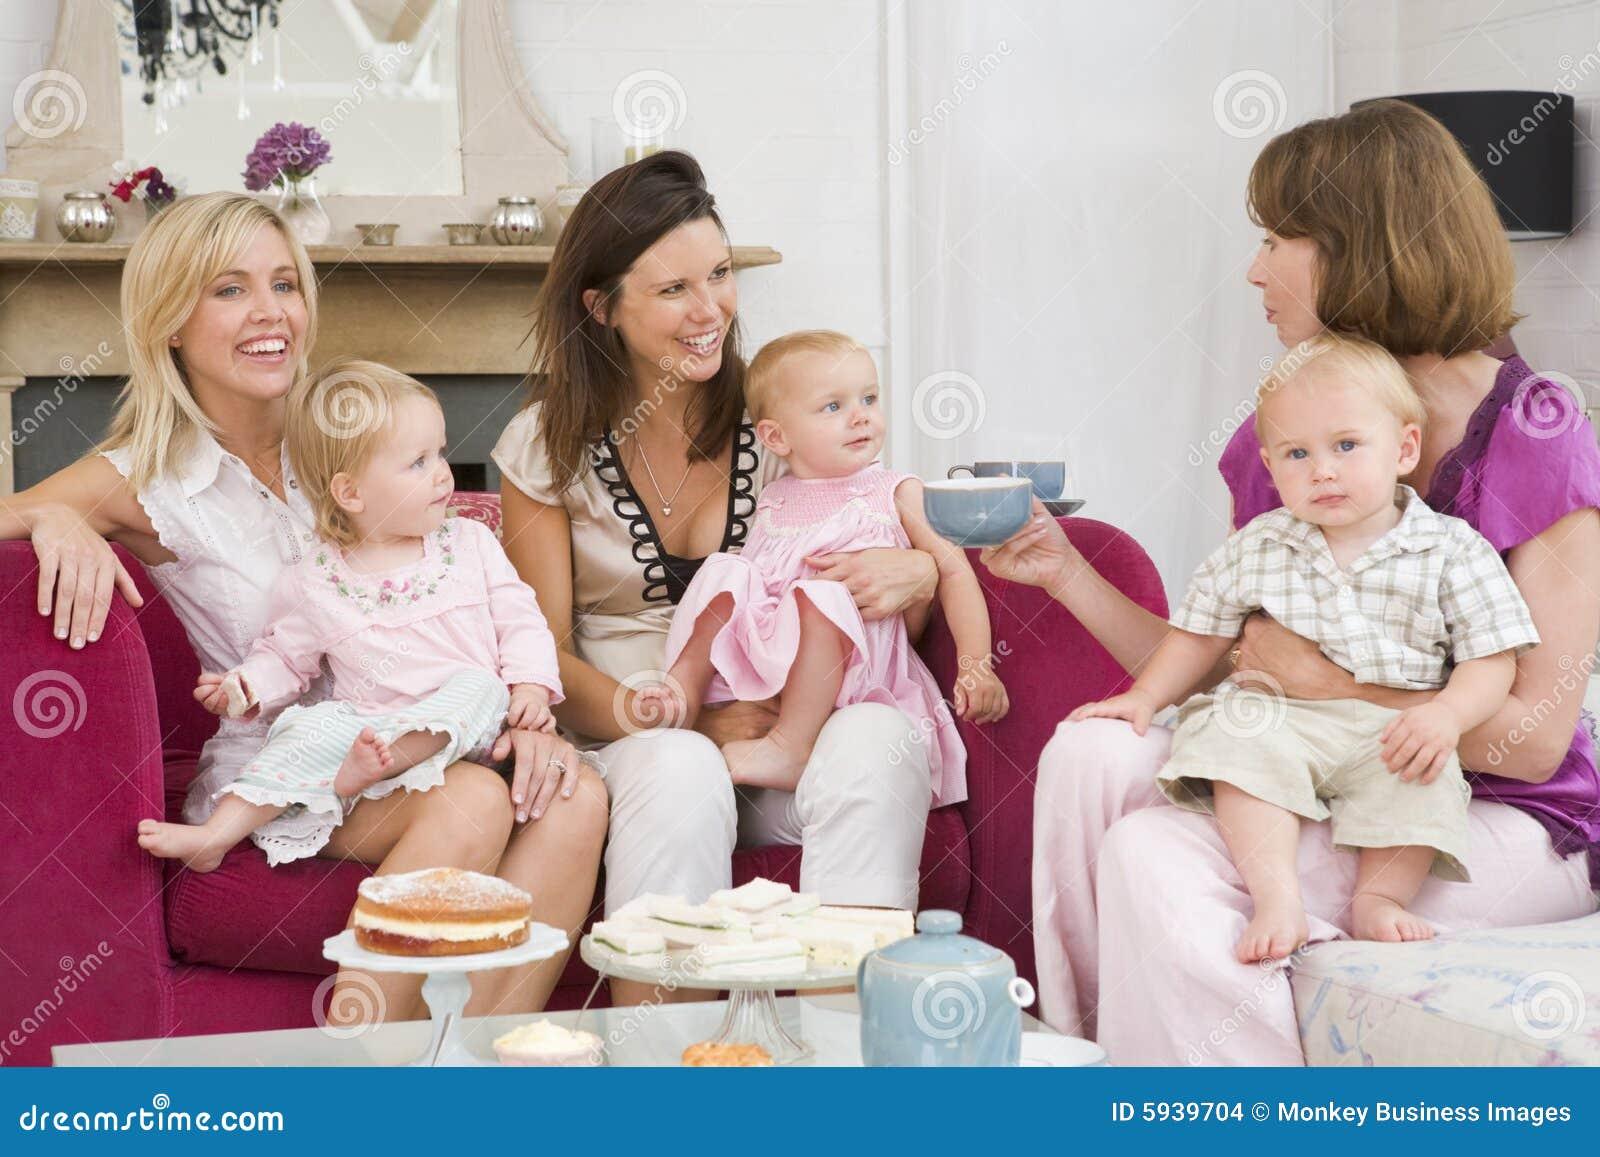 Babies mothers three